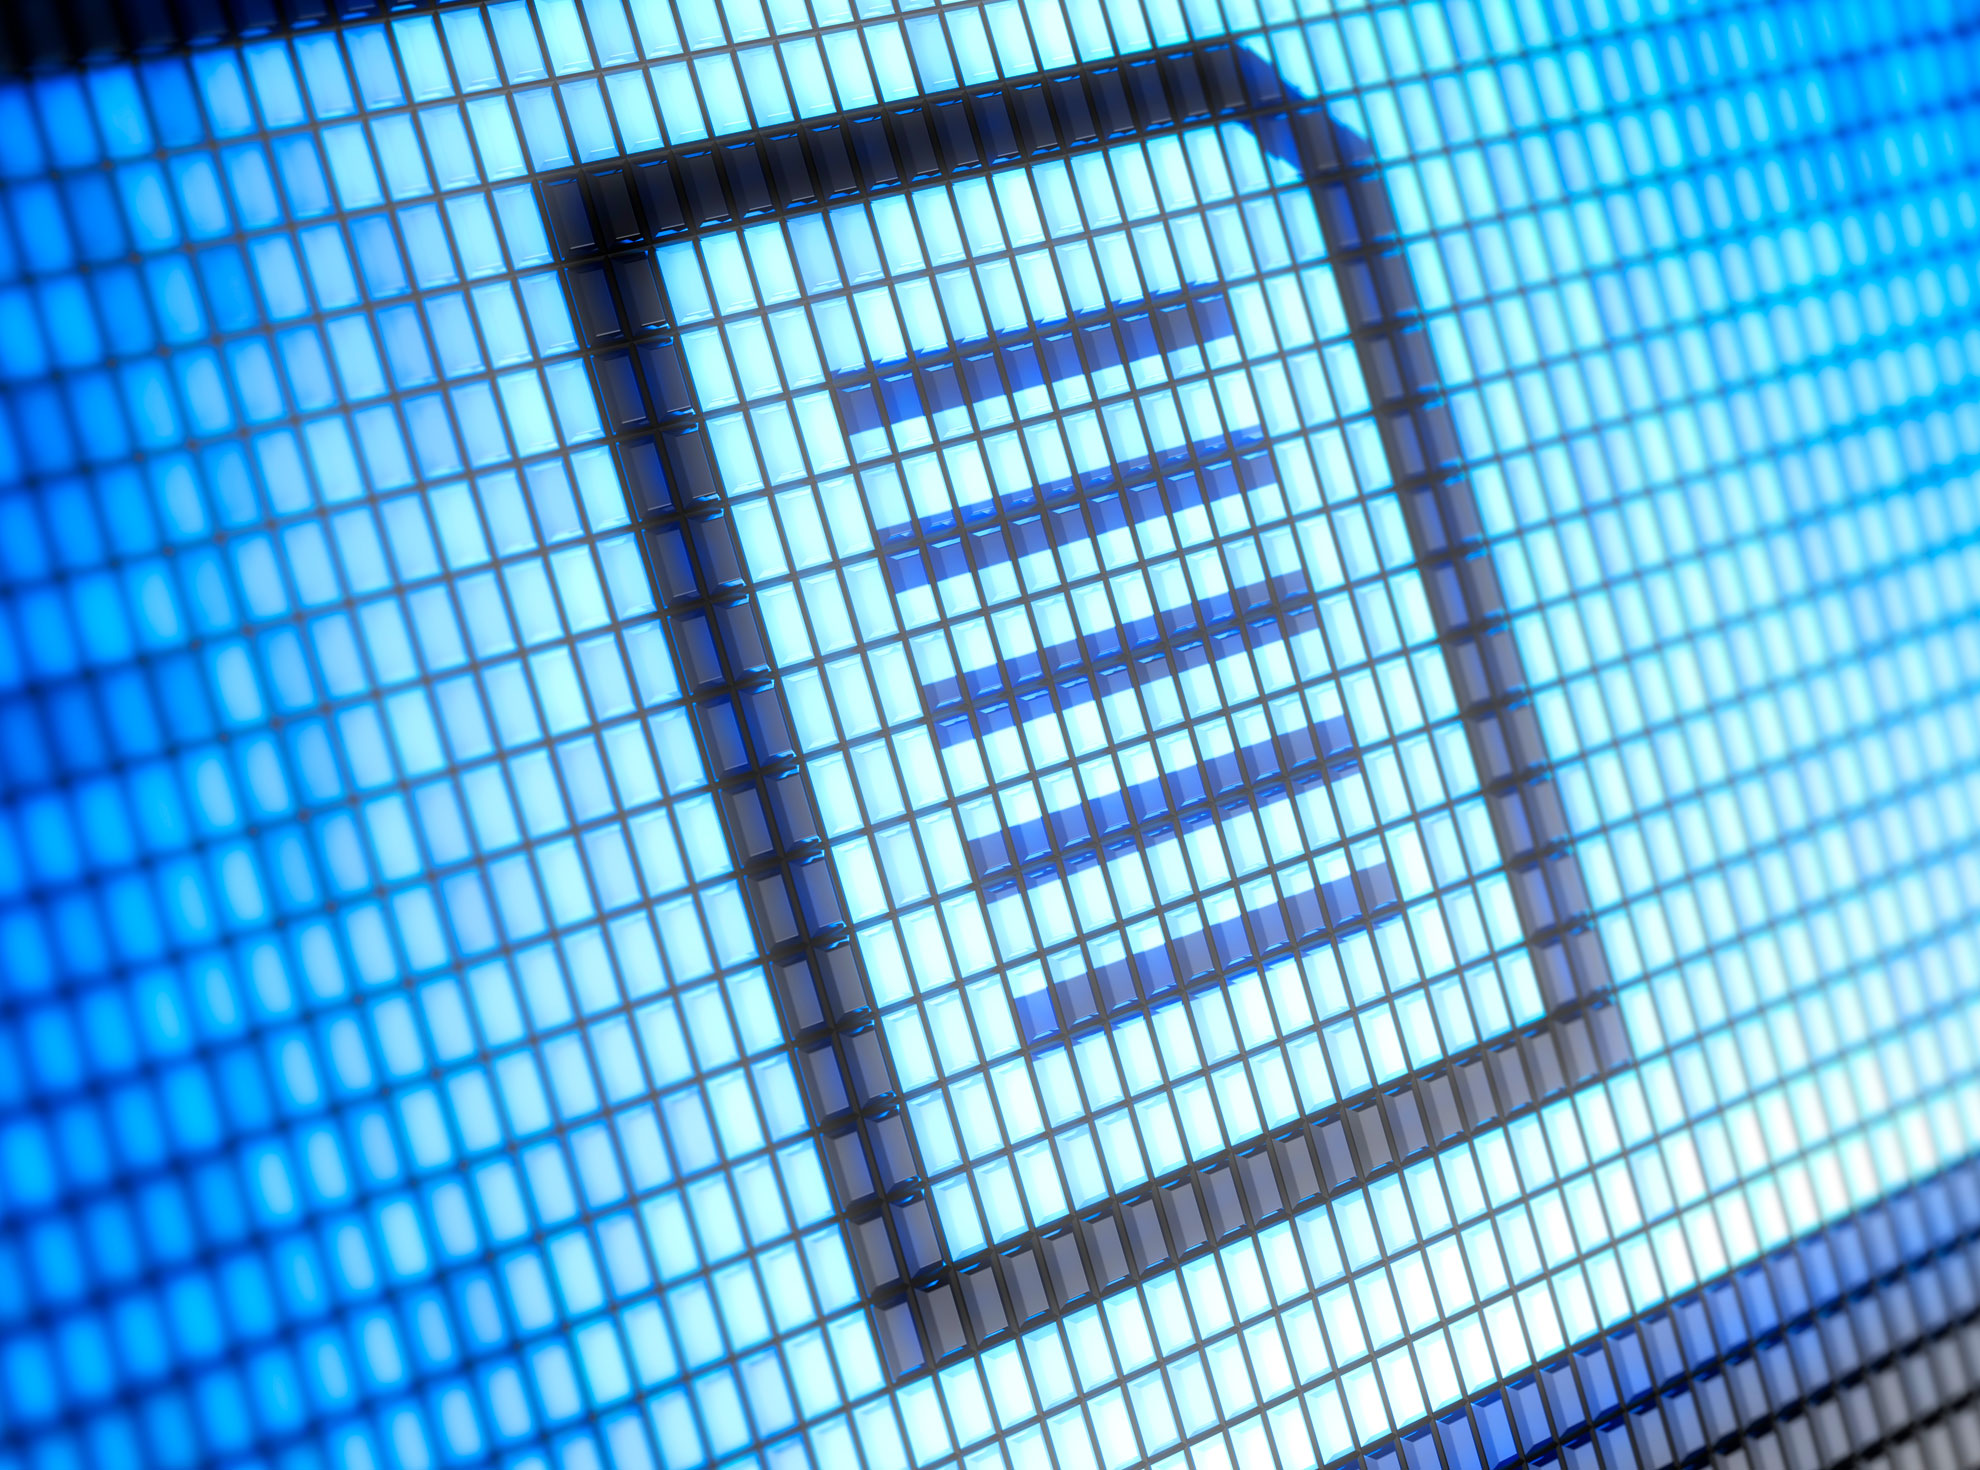 icona gestione archivi digitali